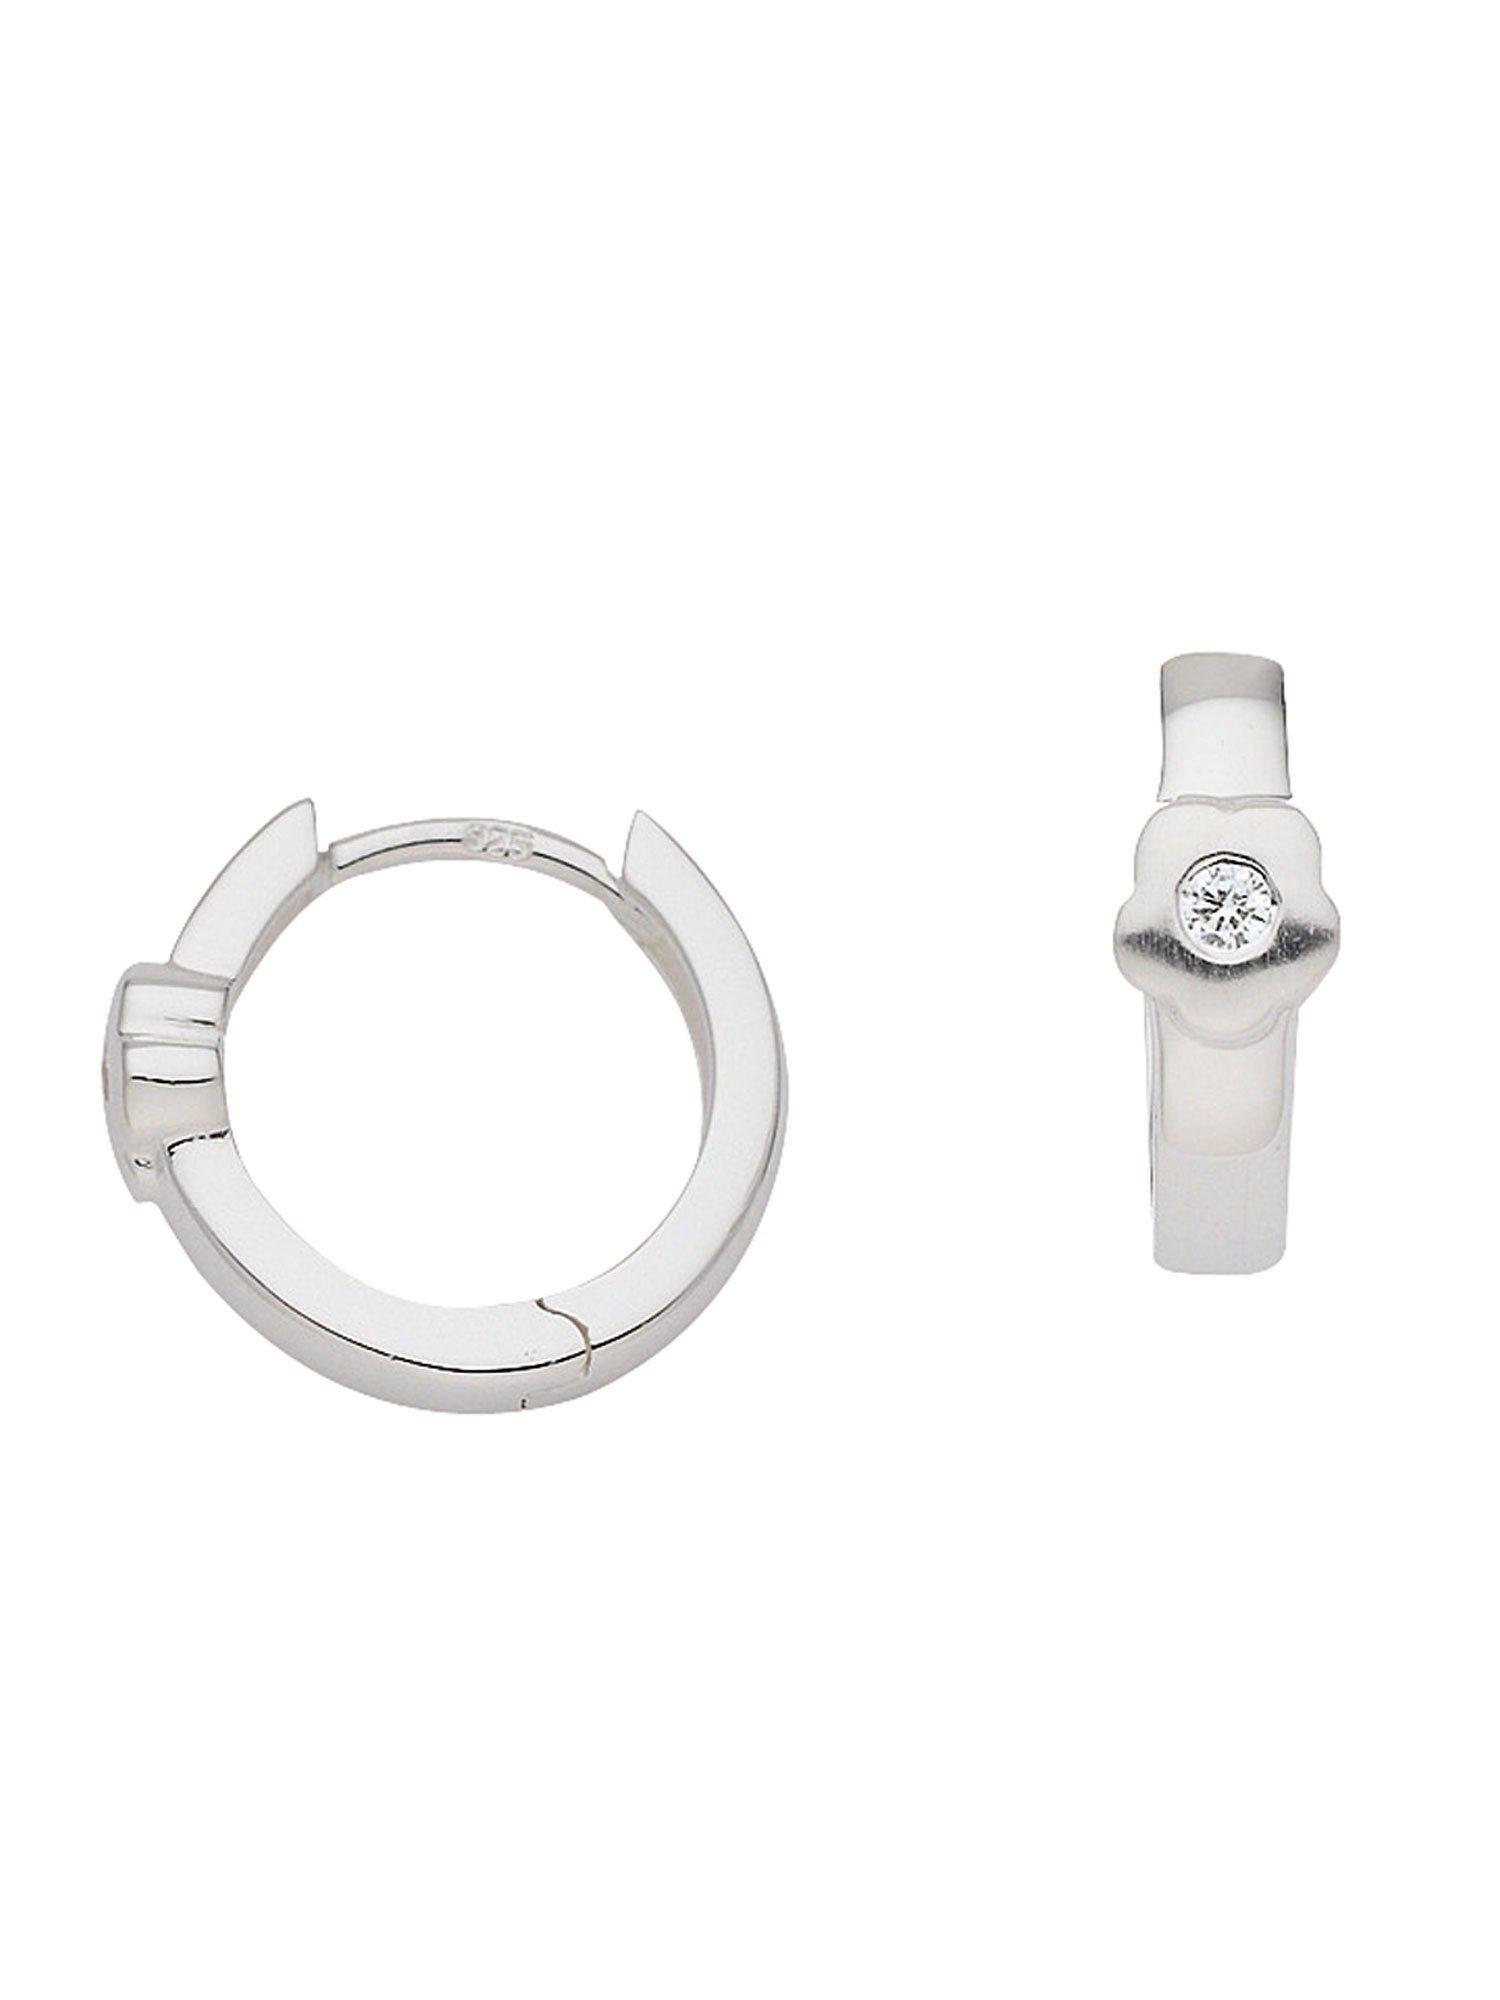 Adelia´s Paar Creolen »Silber 925 Sterling Silver Ohrringe - Creolen« Blüte 925 Sterling Silber mit Zirkonia Ø 1.33 cm